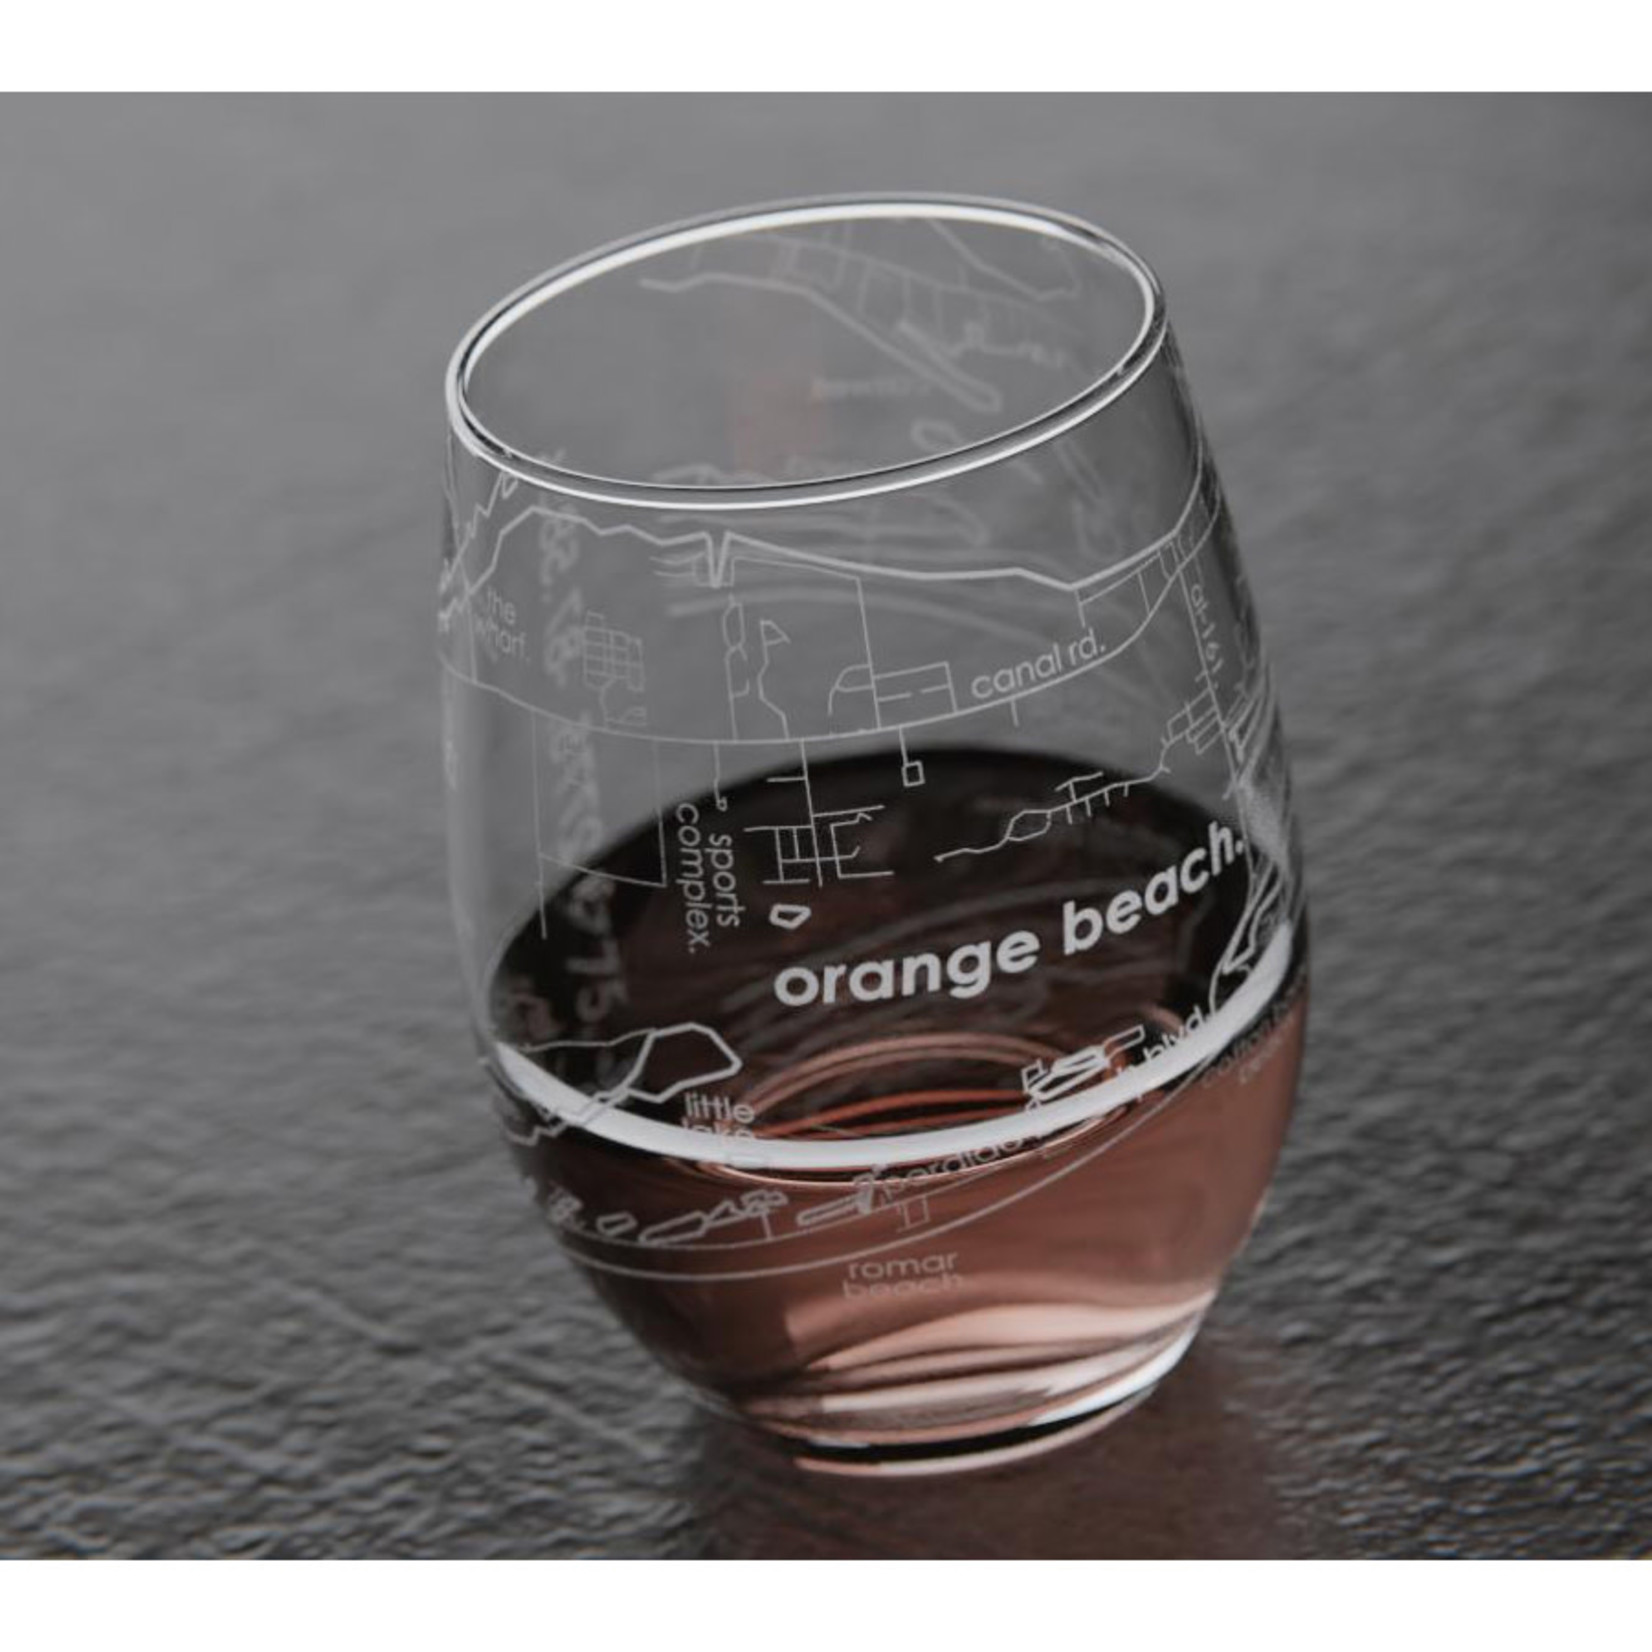 Well Told Orange Beach Map Stemless Wine Glass